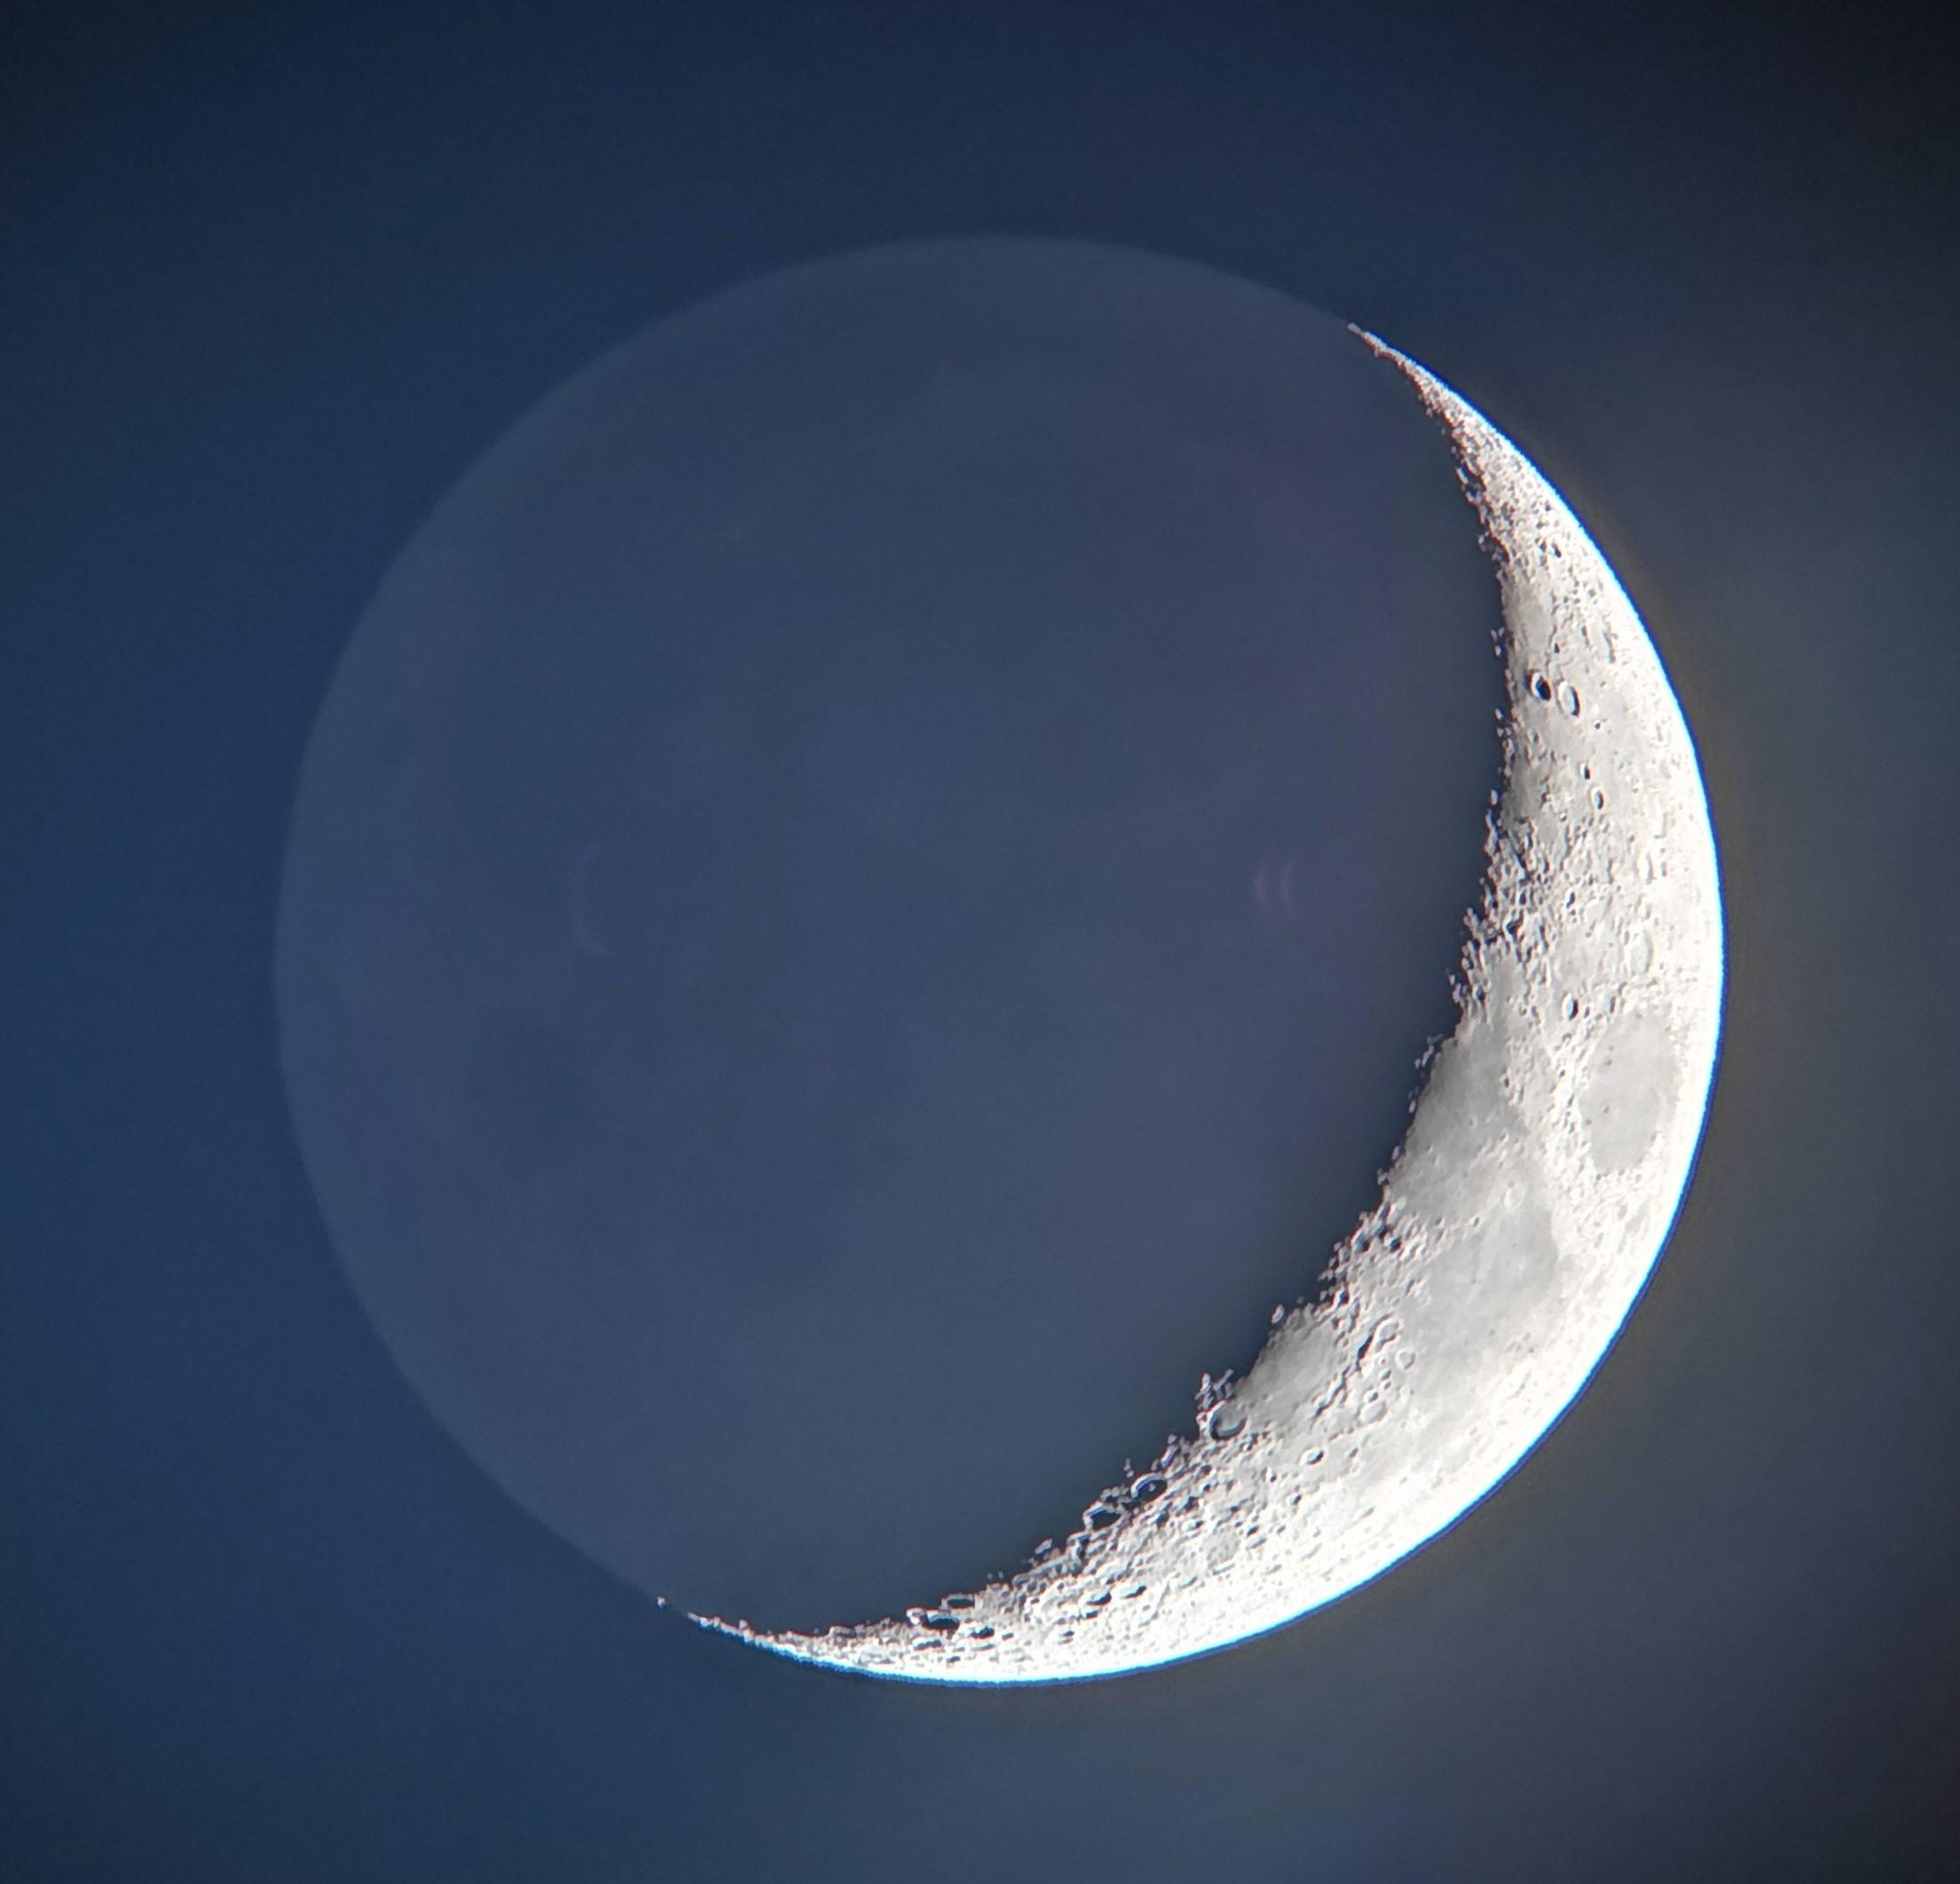 Lune_20190409_231402.jpg